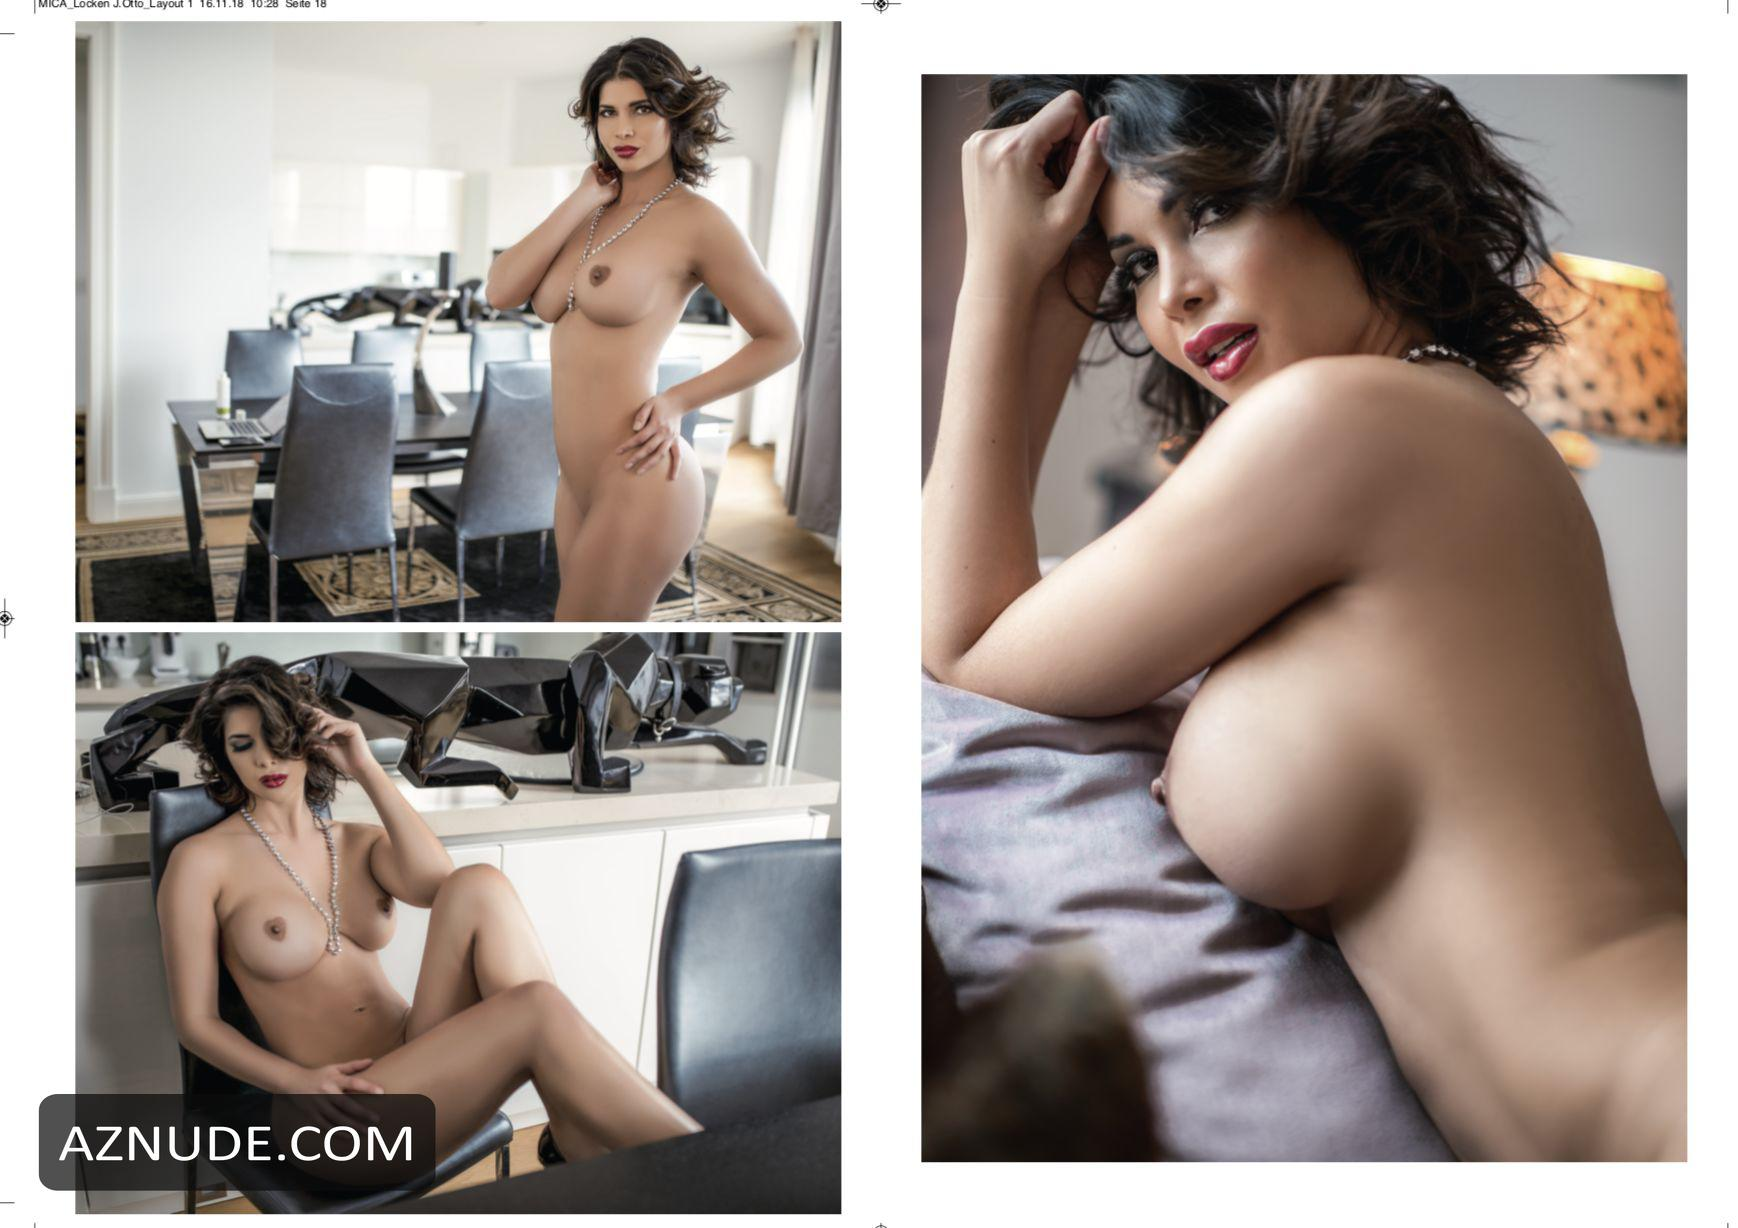 Micaela Schaefer Naked Nude Celebrity Photos